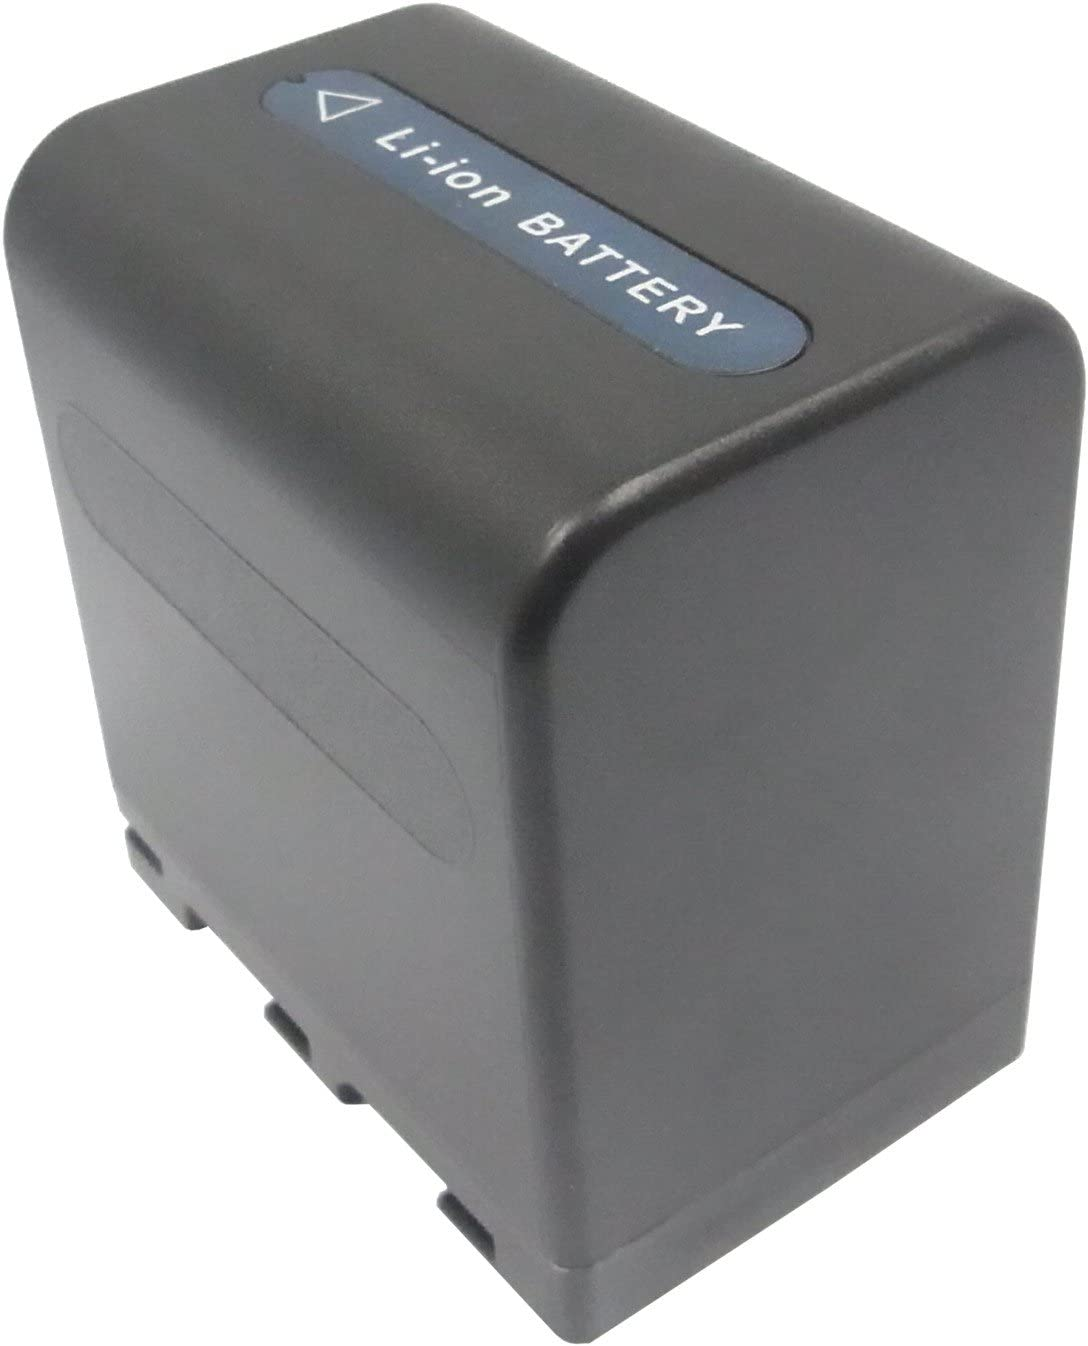 Battery Replacement for Sony DCR-TRV240 DCR-TRV240 DCR-TRV25 DCR-TRV250 DCR-TRV260 DCR-TRV27 DCR-TRV280 Record